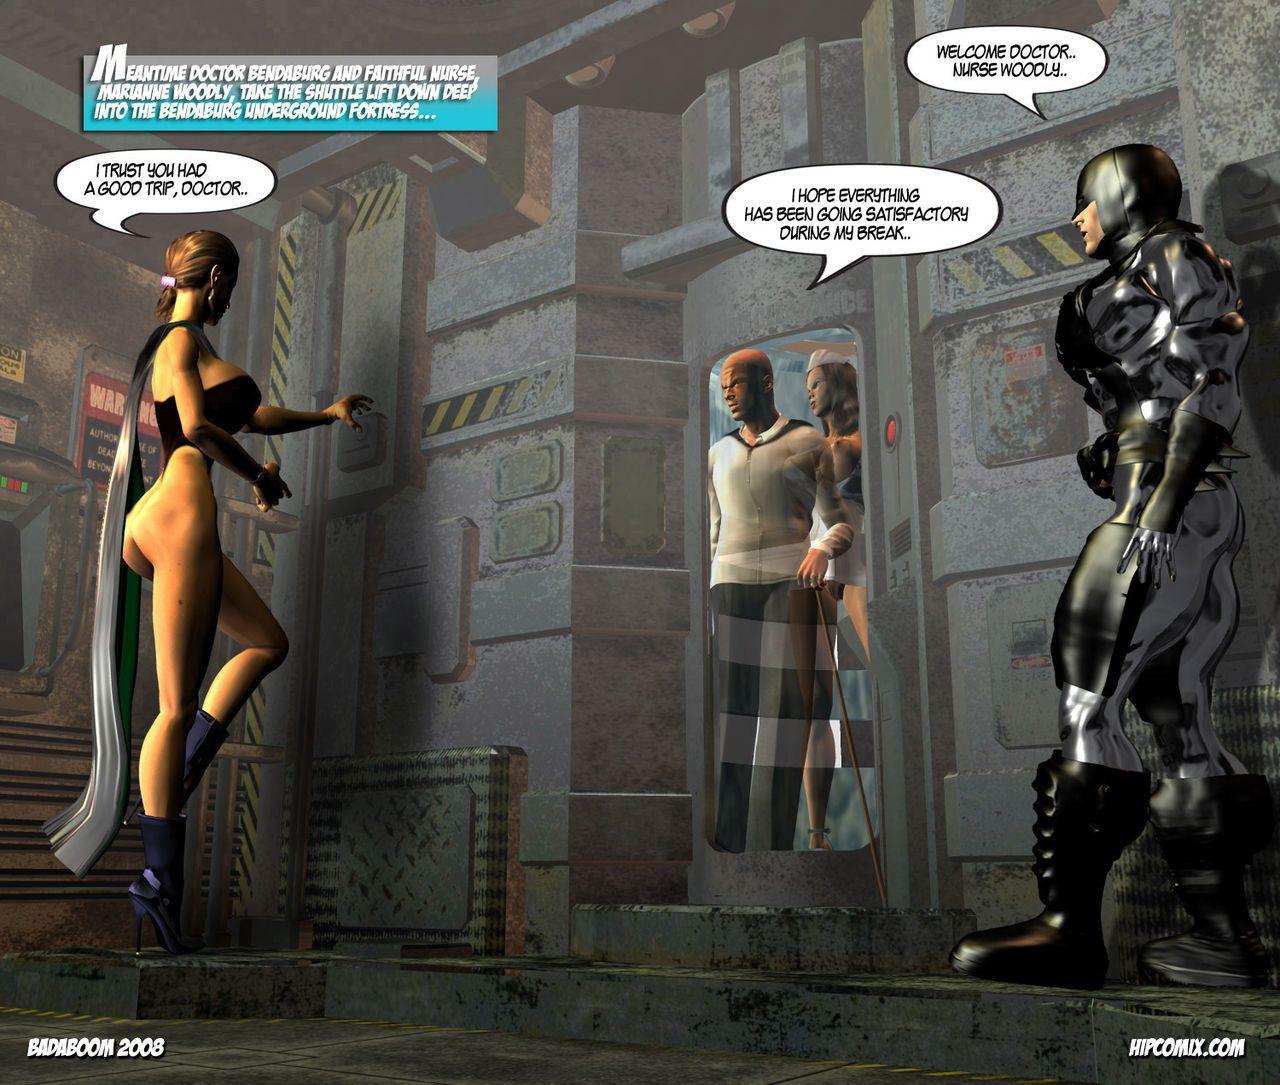 Badaboom Allura 6 Issue 16 and 17 (English) - part 3